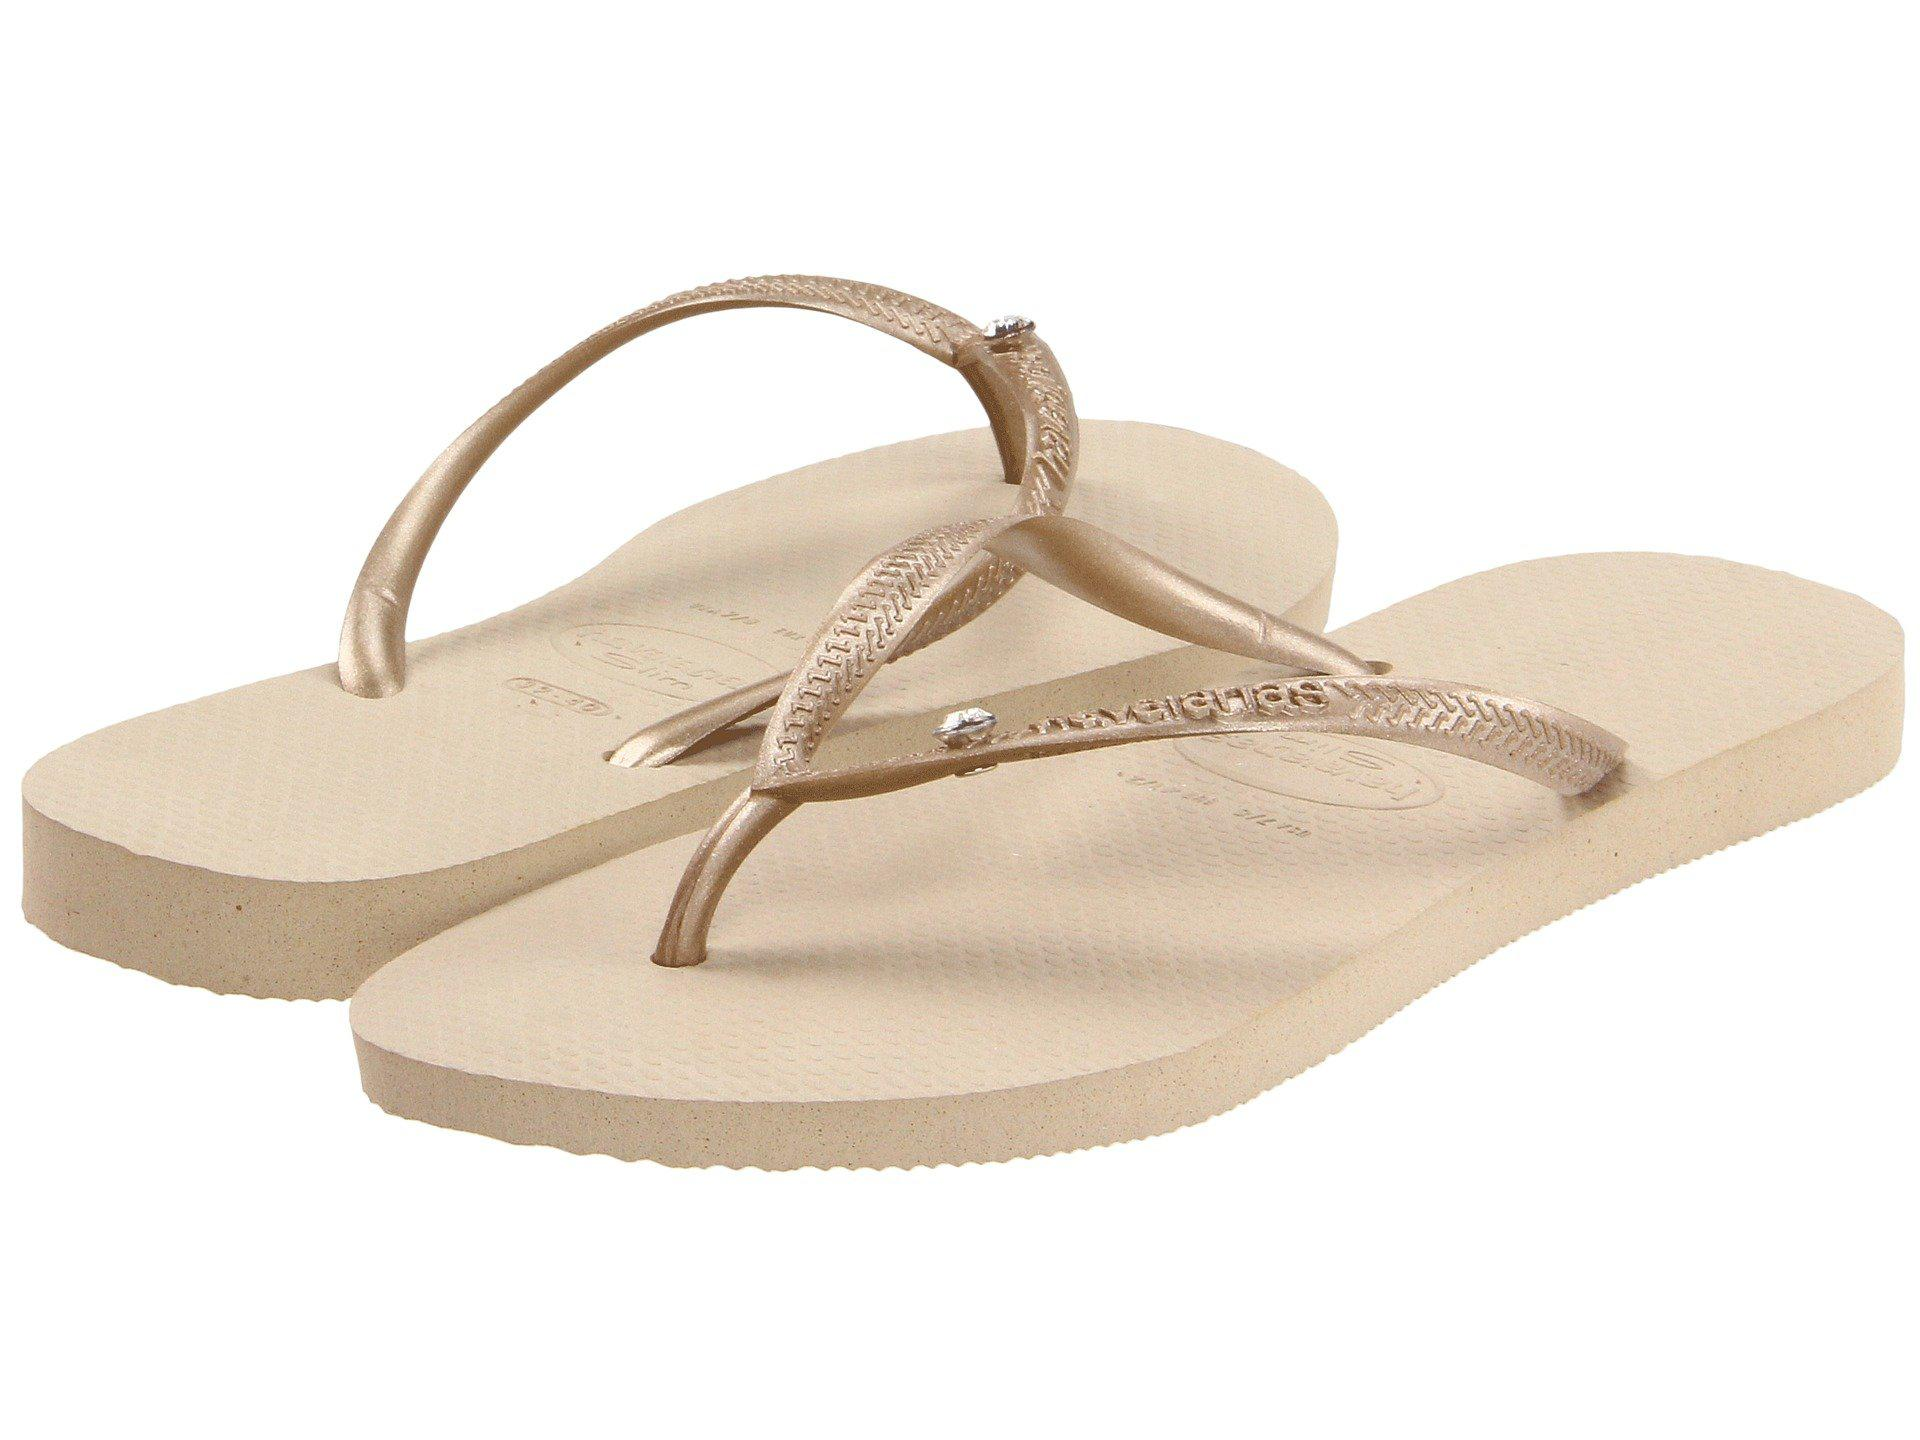 e2303d0ed336 Havaianas. Natural Slim Crystal Glamour Sw Flip Flops (black) Women s  Sandals